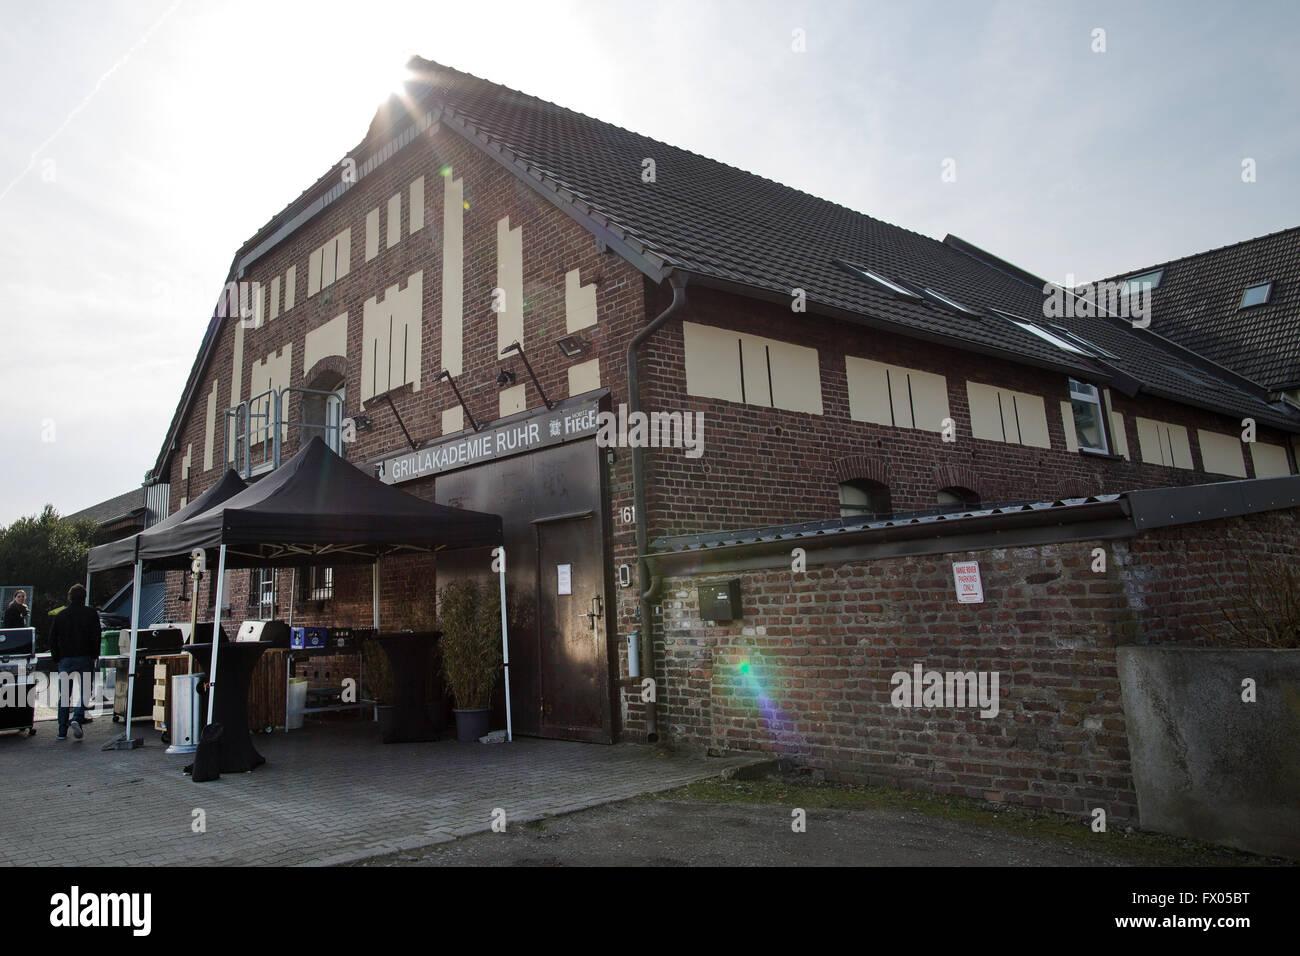 . Bochum  Germany  28th Feb  2016  the Grillakademie  where a Stock